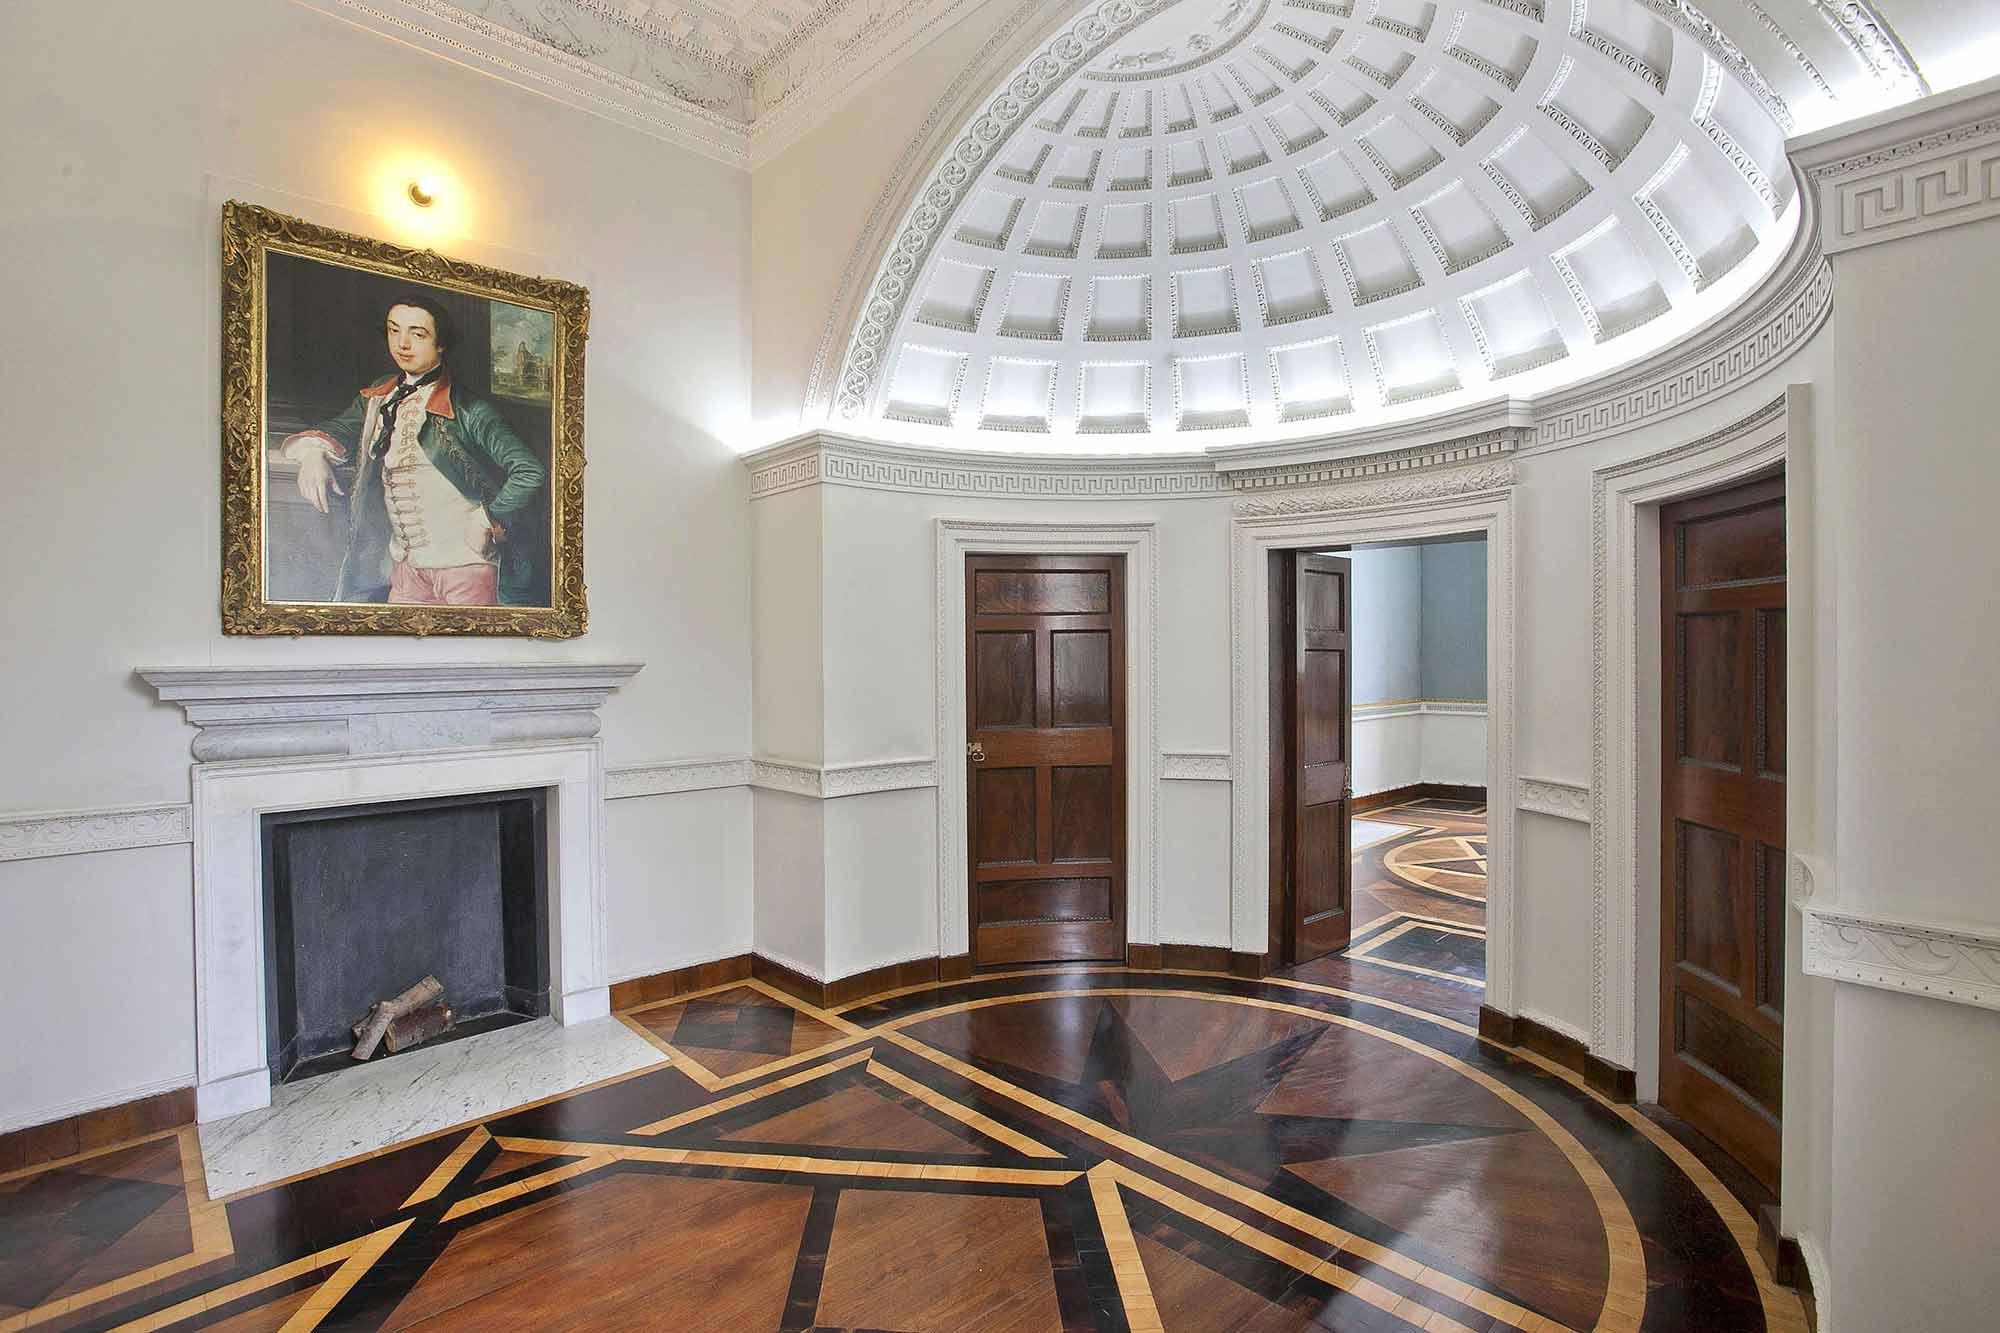 Casino Marino entrance hall with painting of James Caulfeild hanging on wall